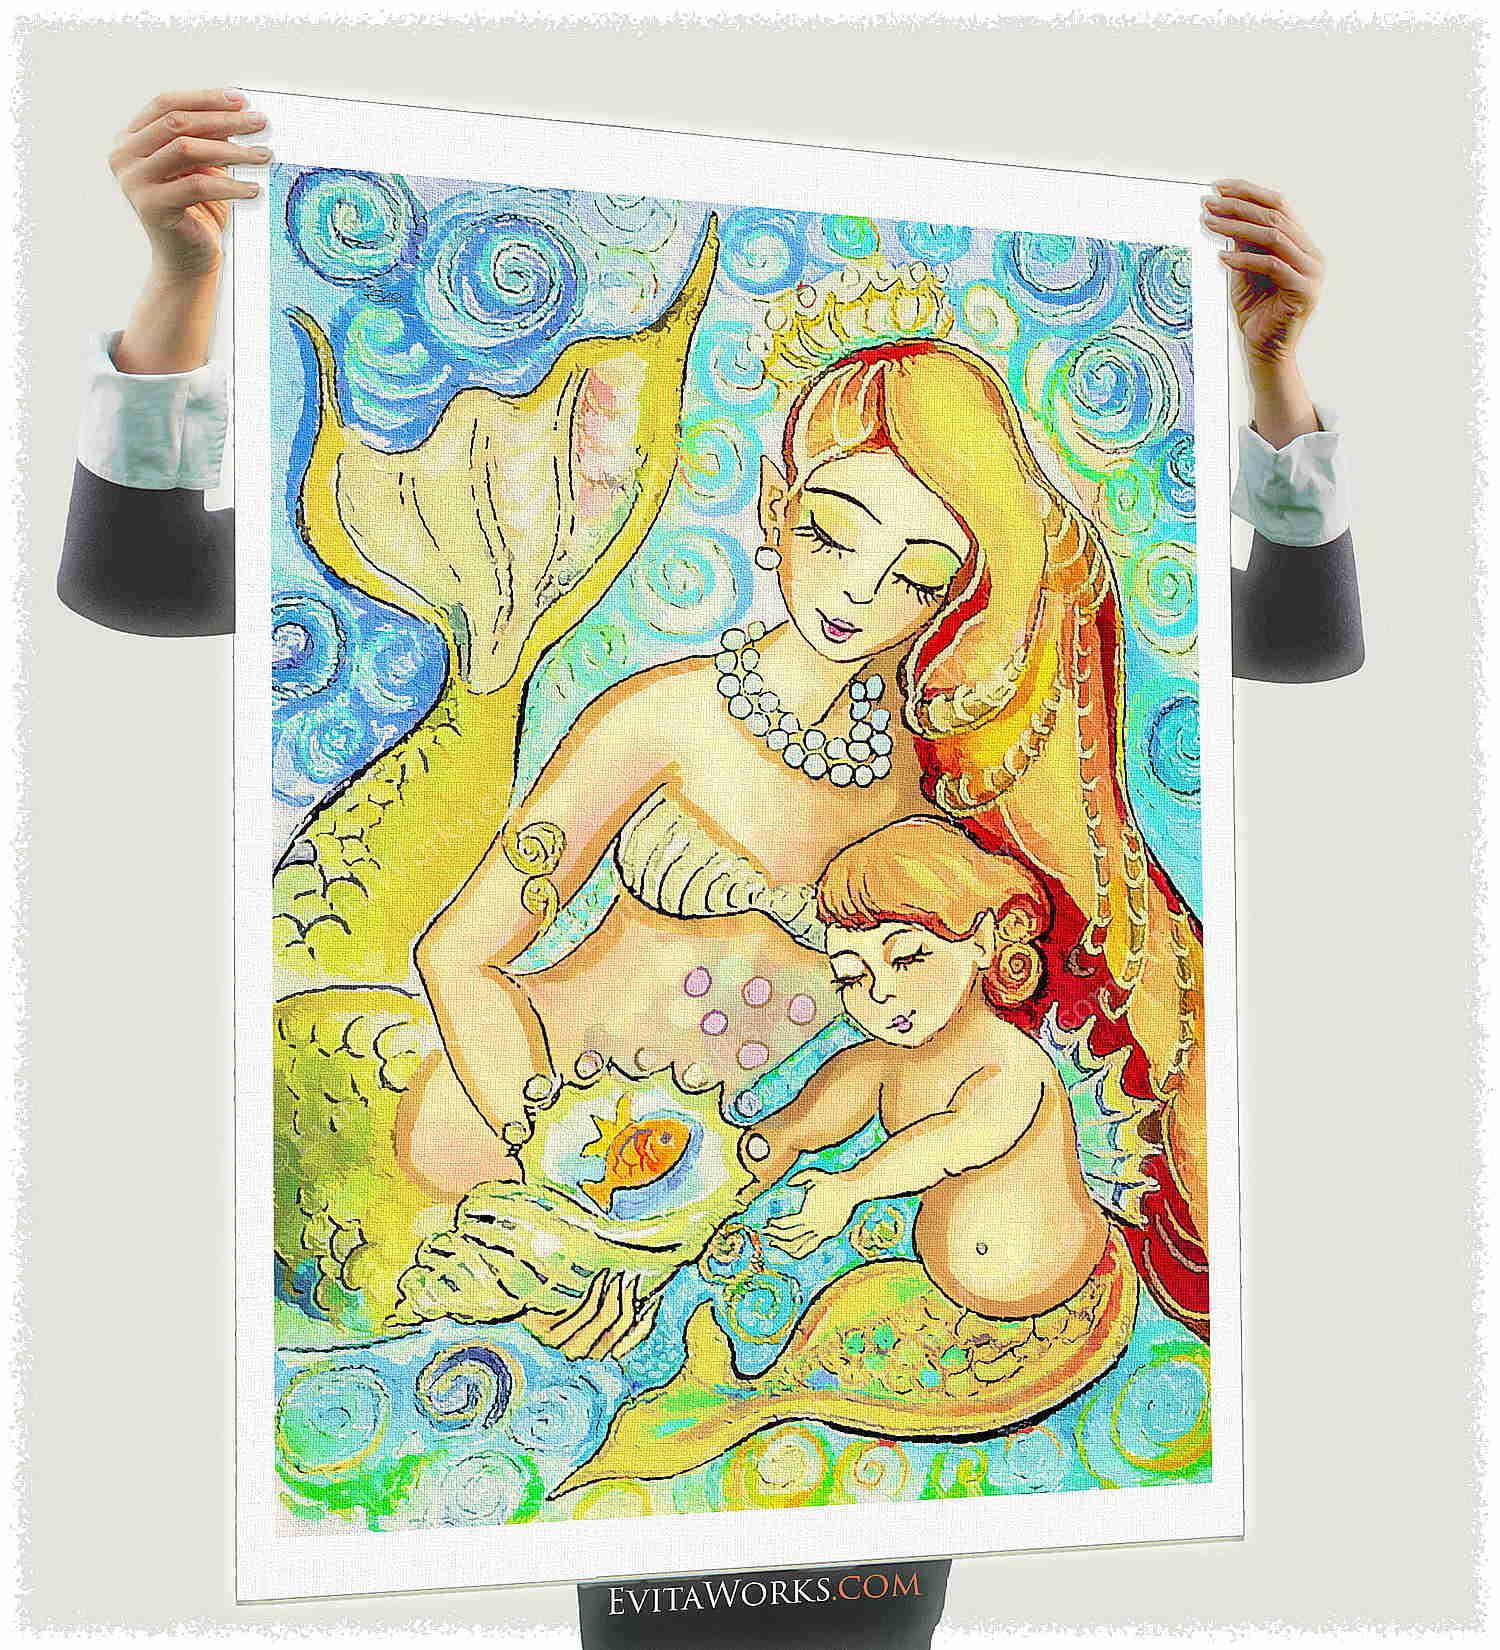 ao mermaid 42 a1 ~ EvitaWorks